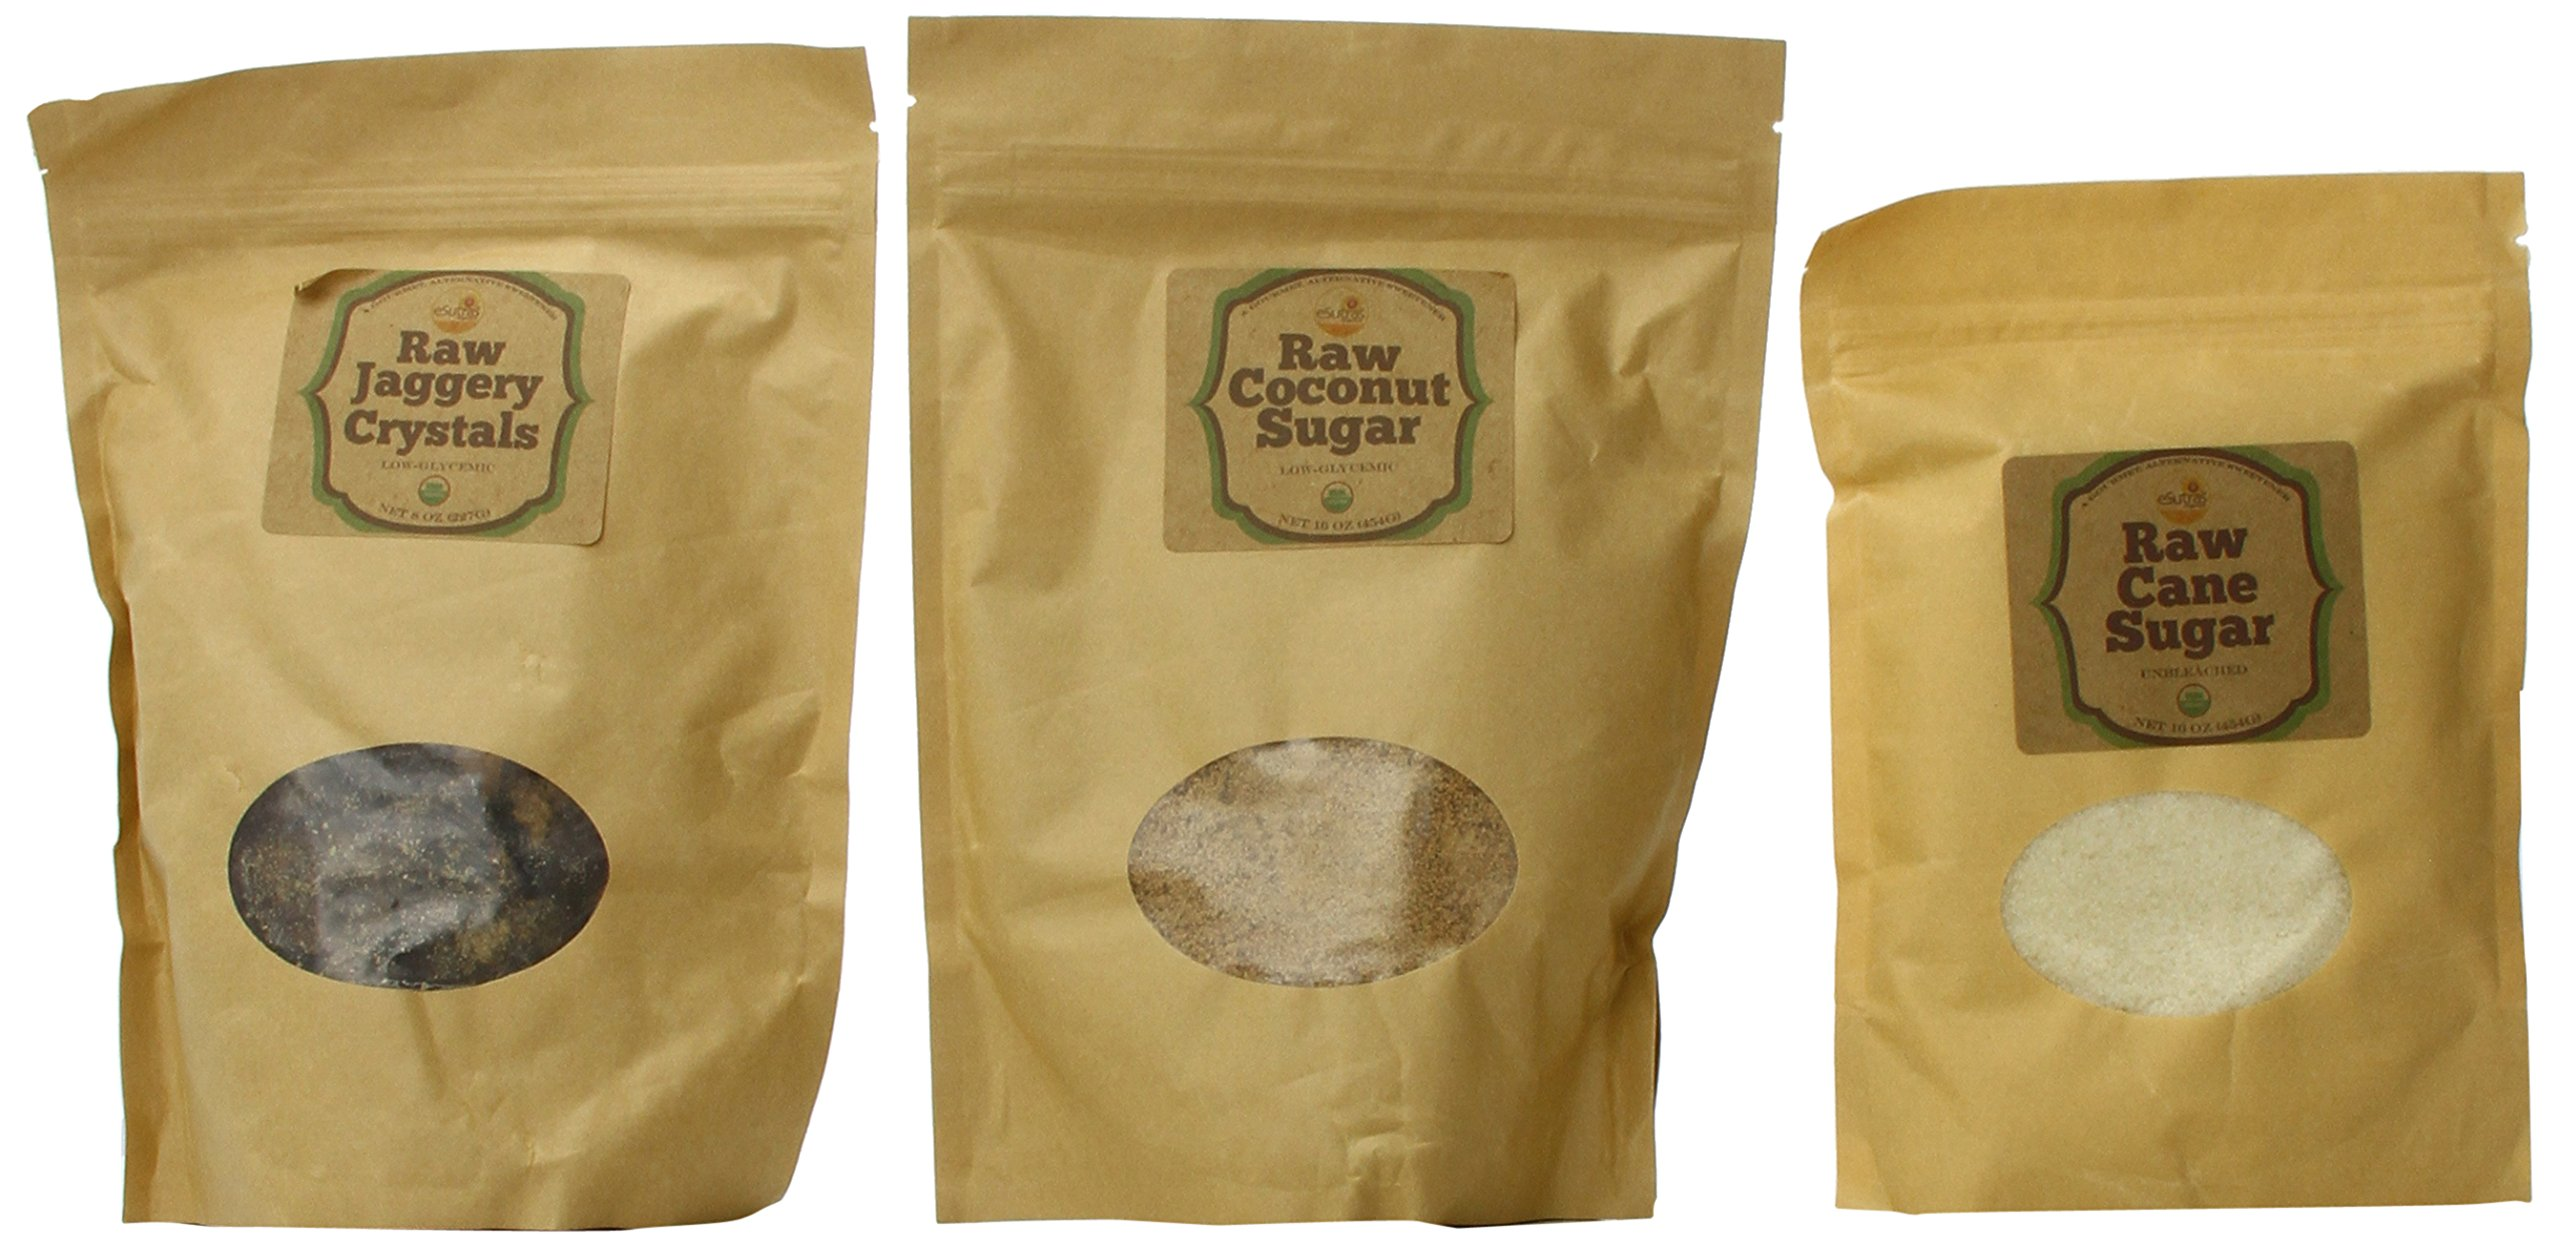 esutras Organics Organic Healthy Sweeteners Pack, 40 Ounce by eSutras Organics